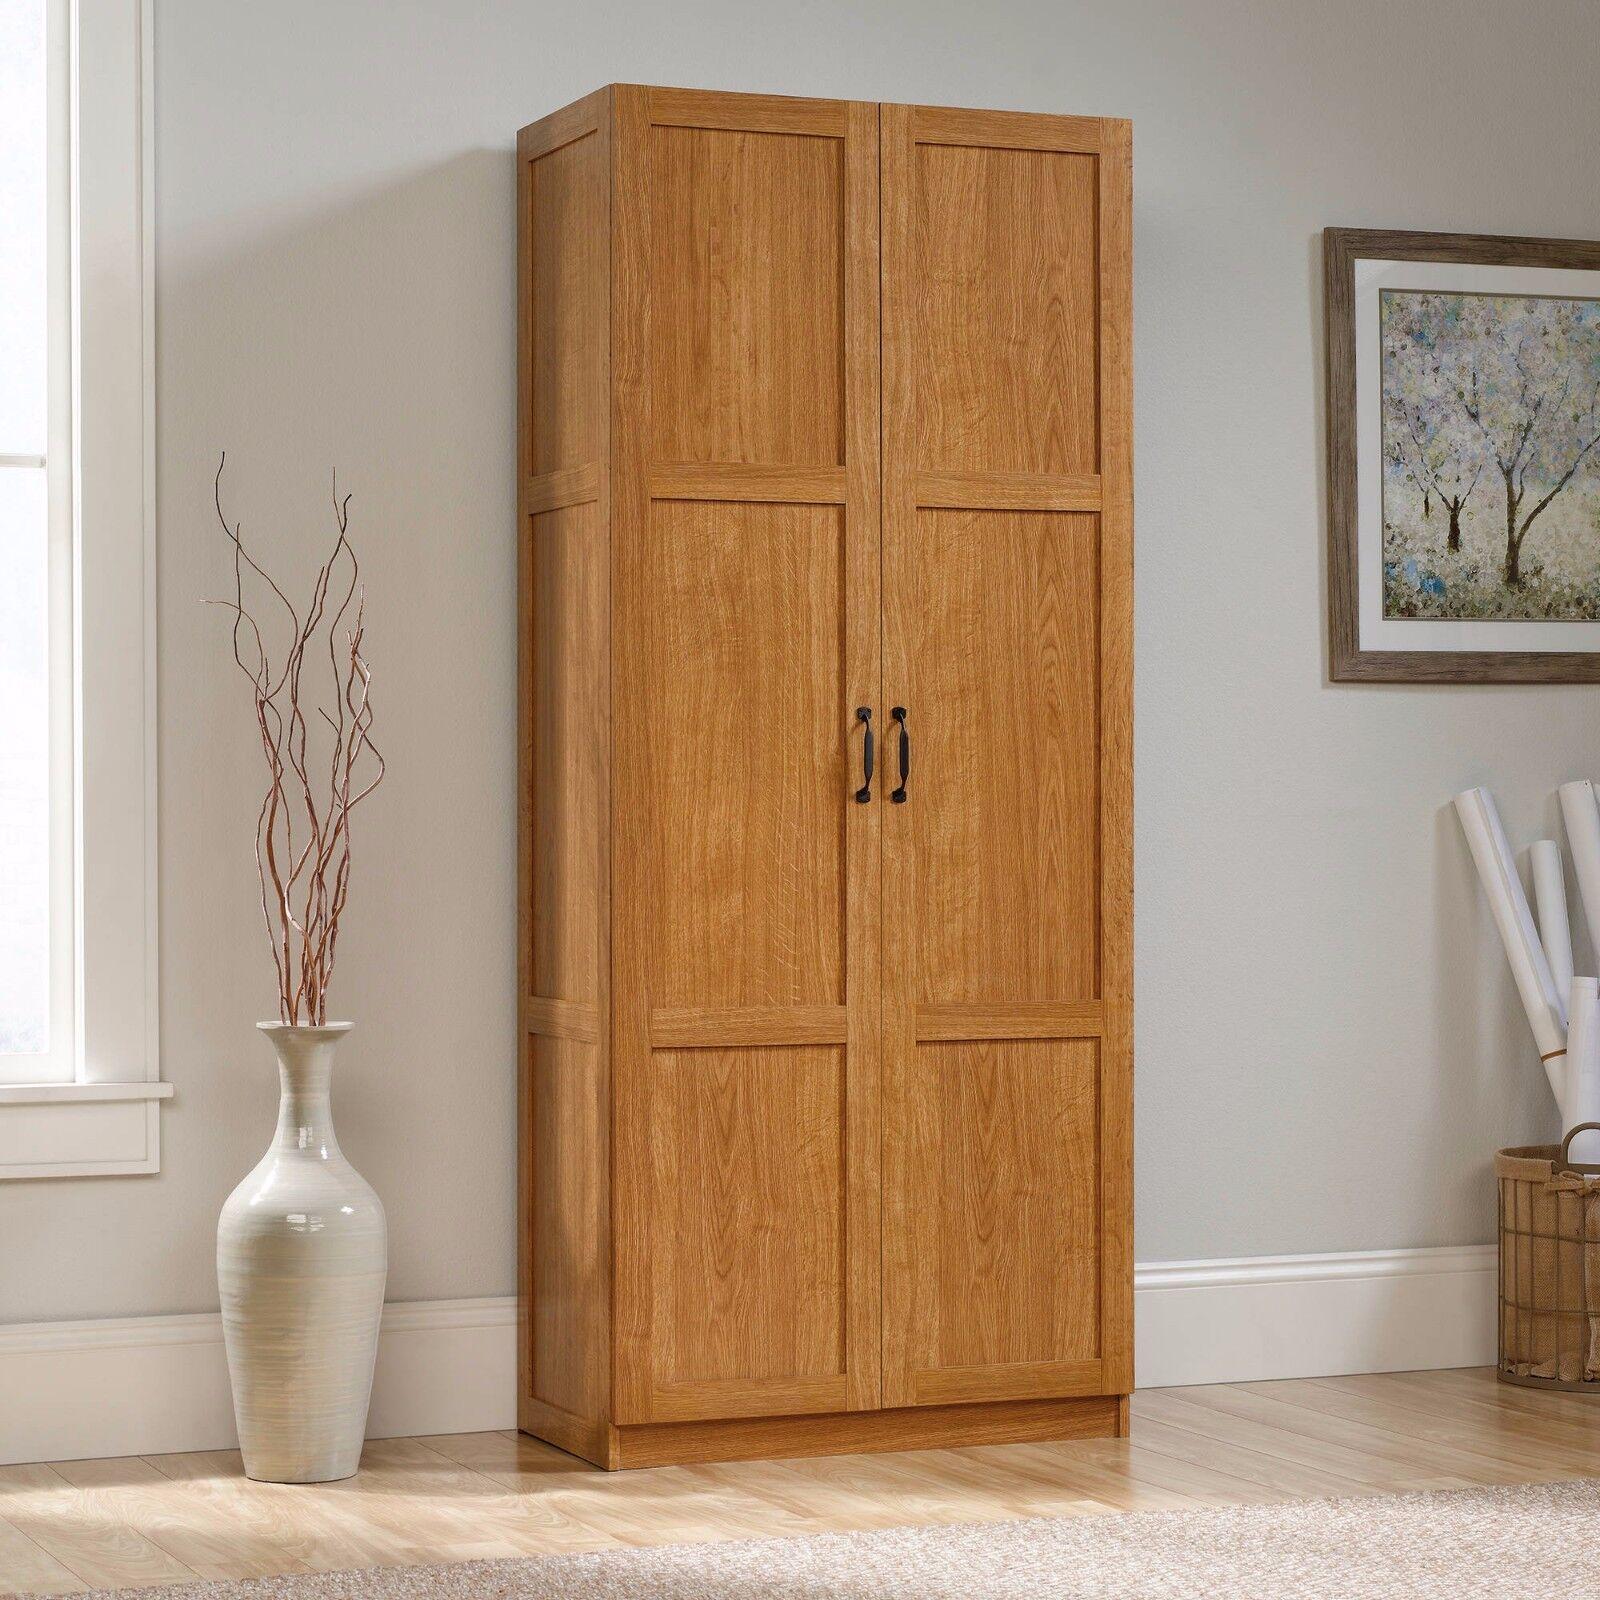 Sauder Storage Cabinet - 16 Deep 419188 Sgs Light Wood Finis